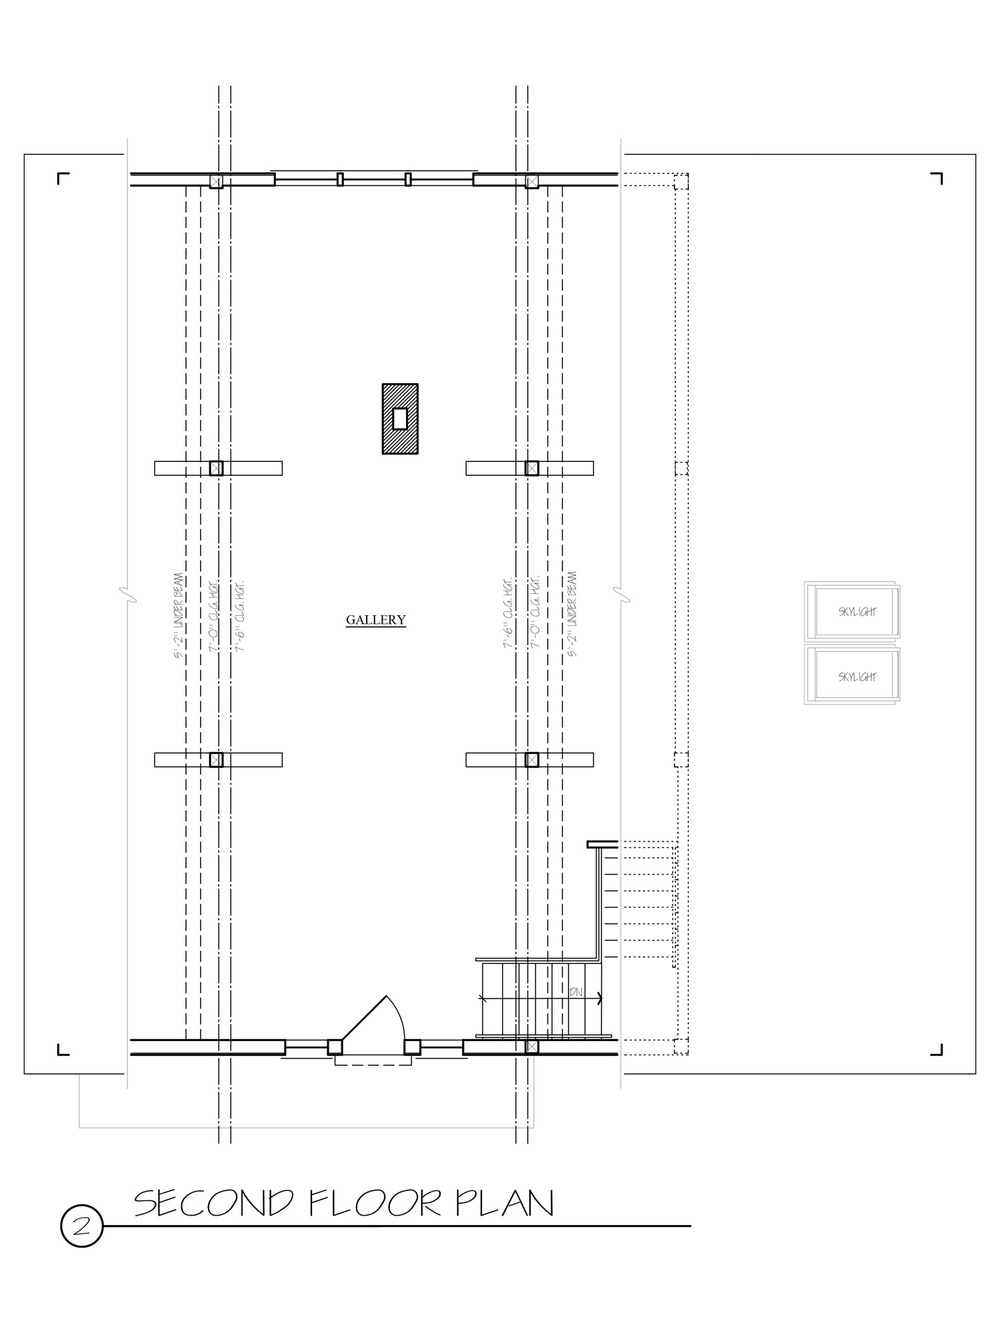 Second-Floor-Plan.upload.jpg